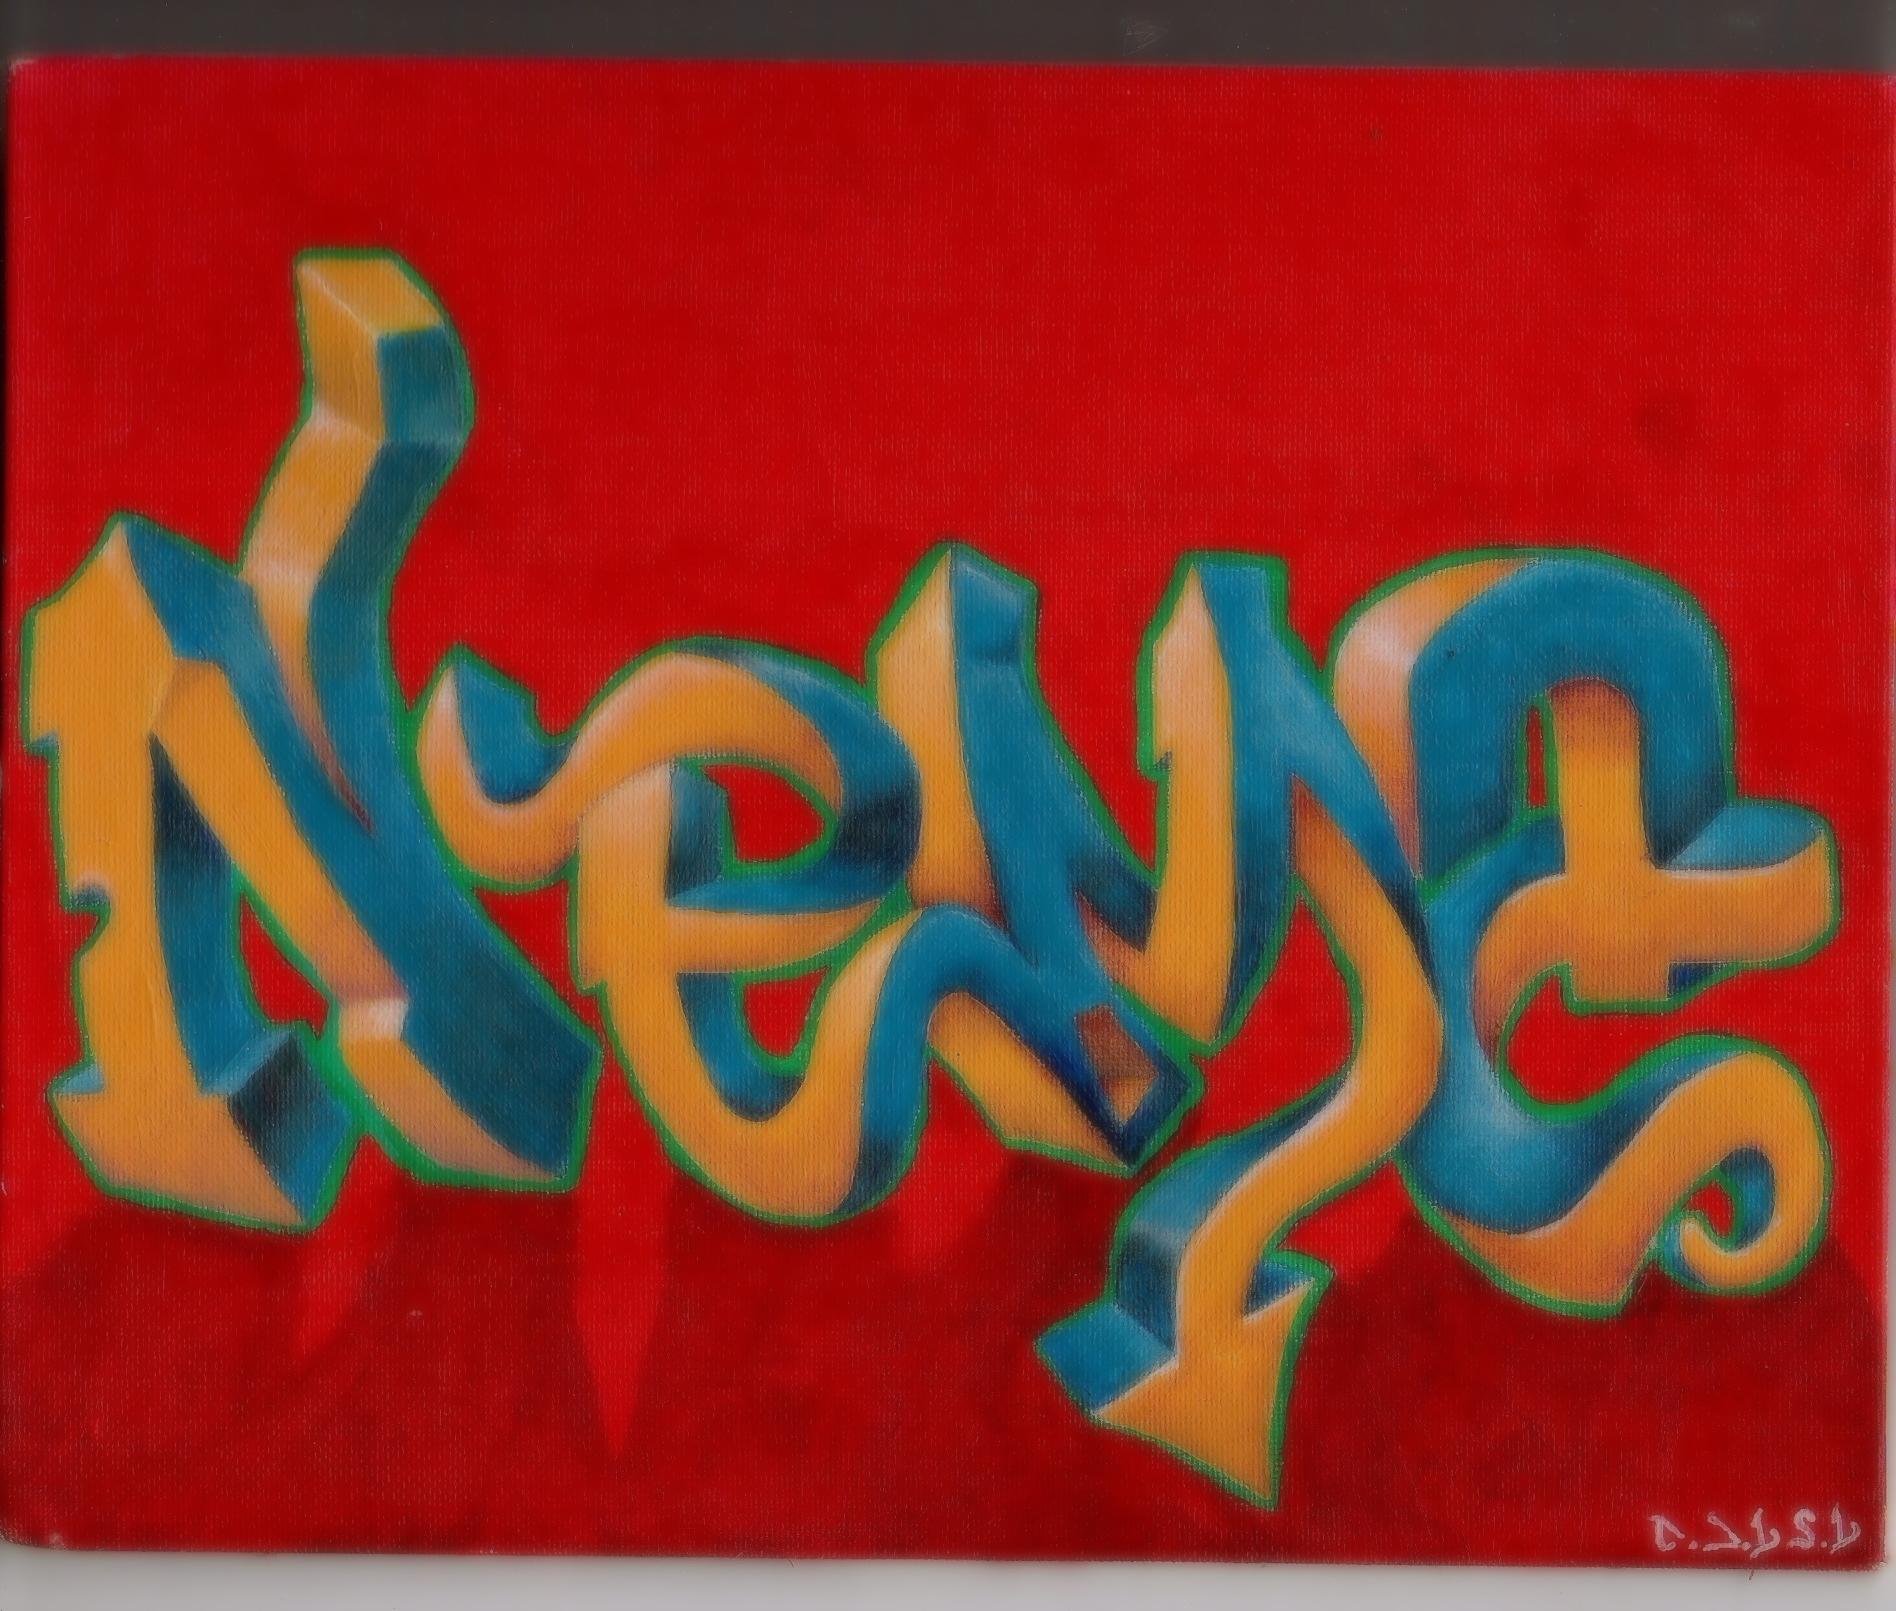 Nema Graffiti response